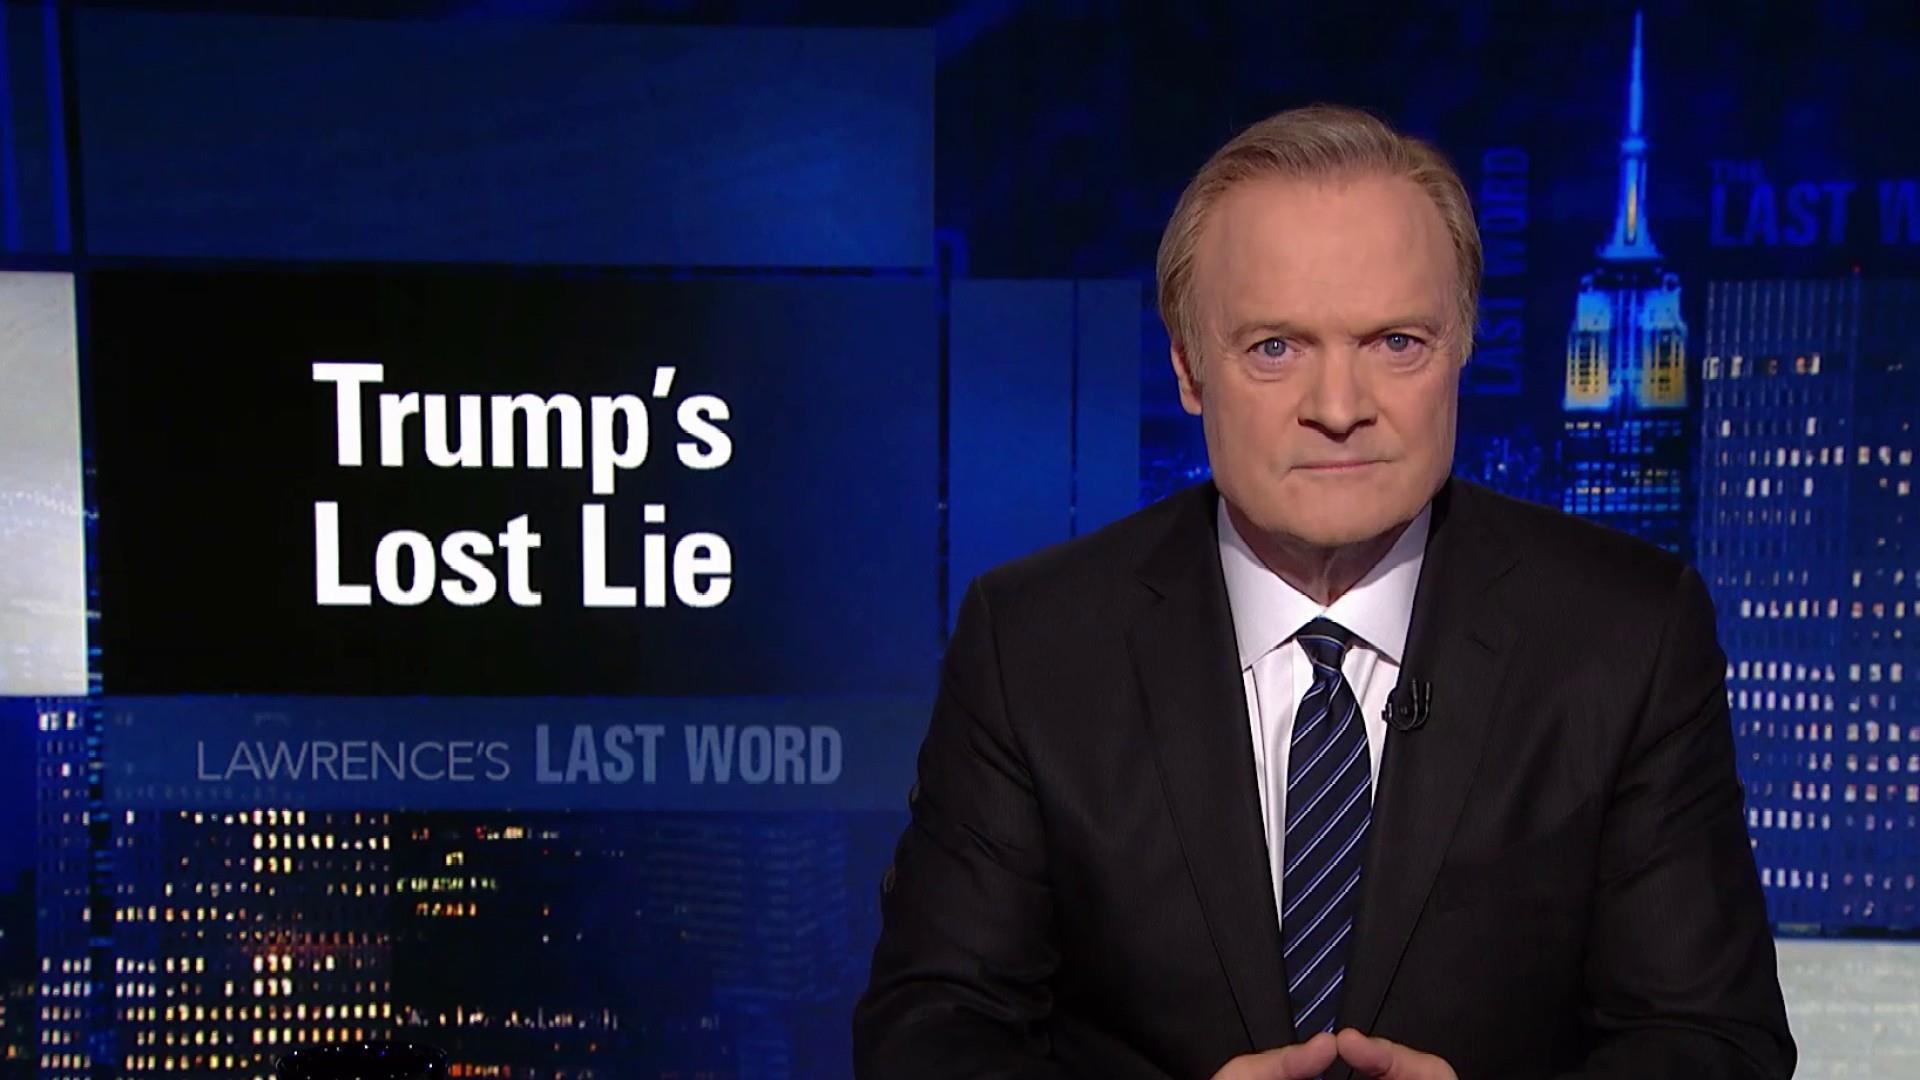 Lawrence's Last Word: Trump's Lost Lie